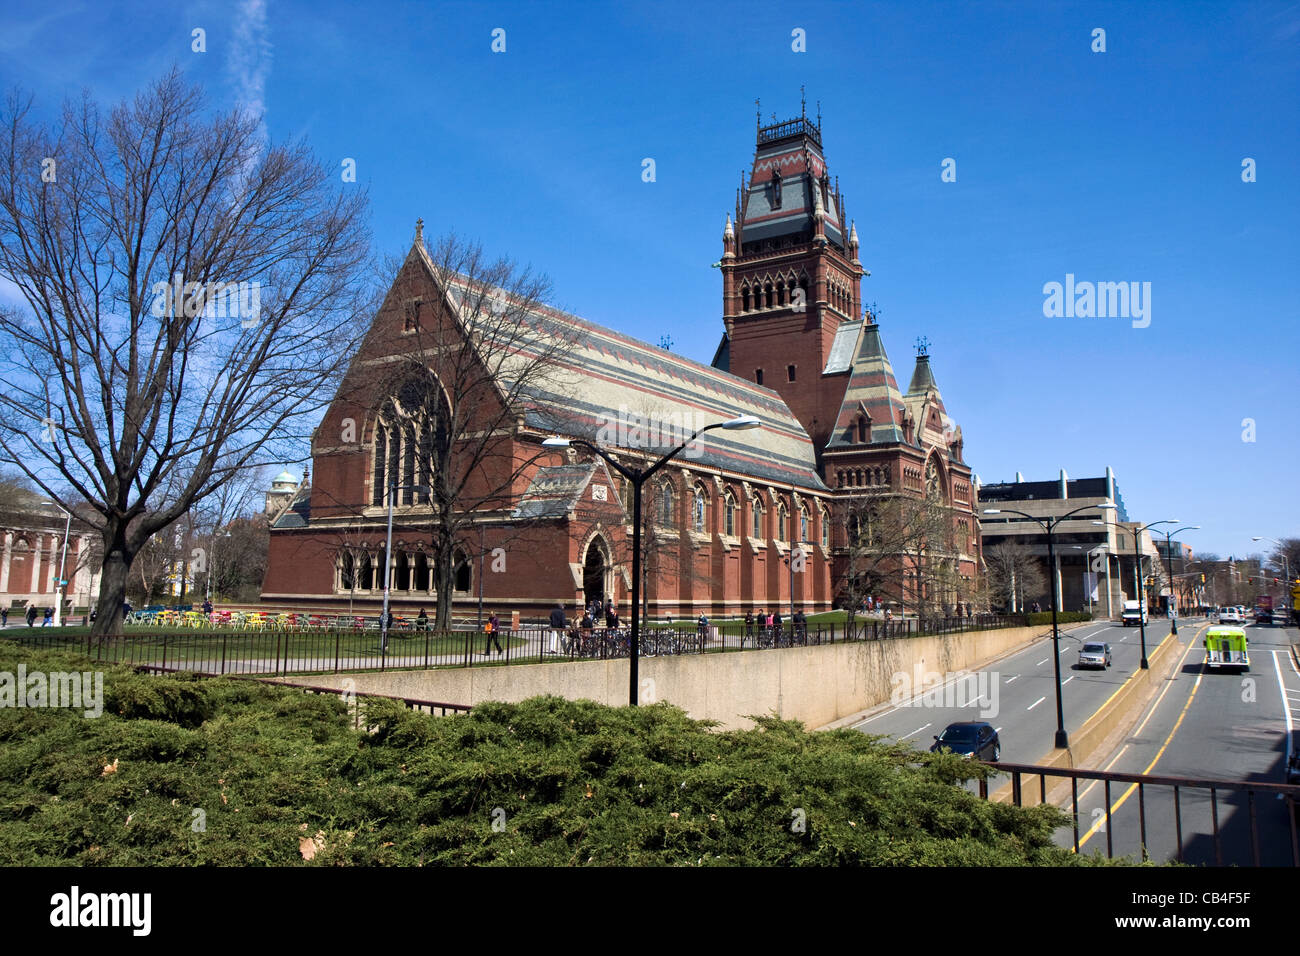 Memorial hall of Harvard university in Cambridge, Massachusetts Stock Photo